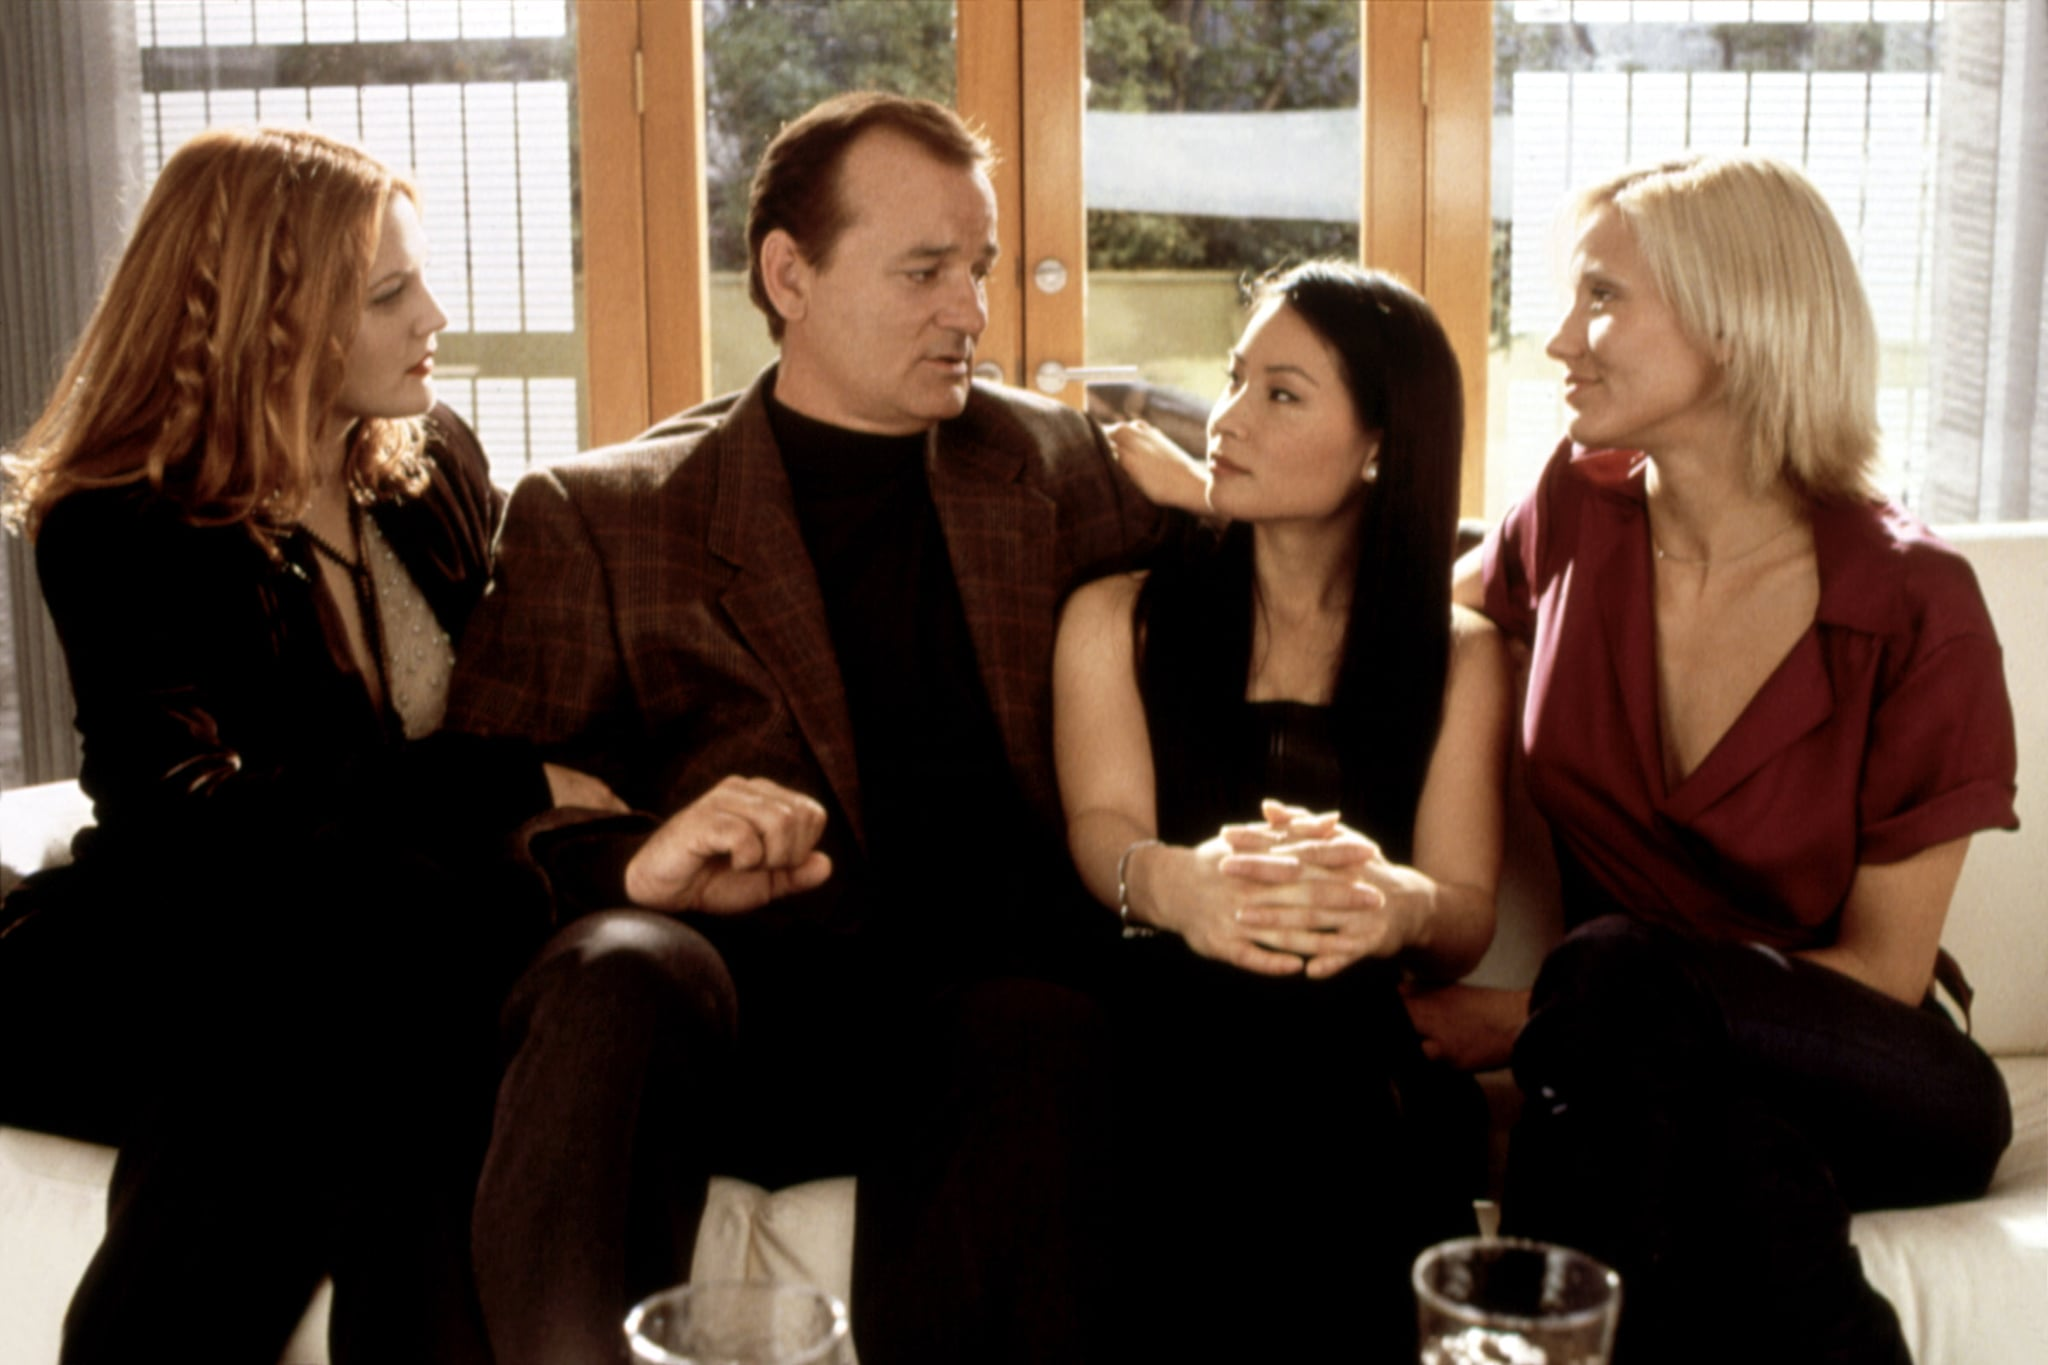 CHARLIE'S ANGELS, Drew Barrymore, Bill Murray, Lucy Liu, Cameron Diaz, 2000